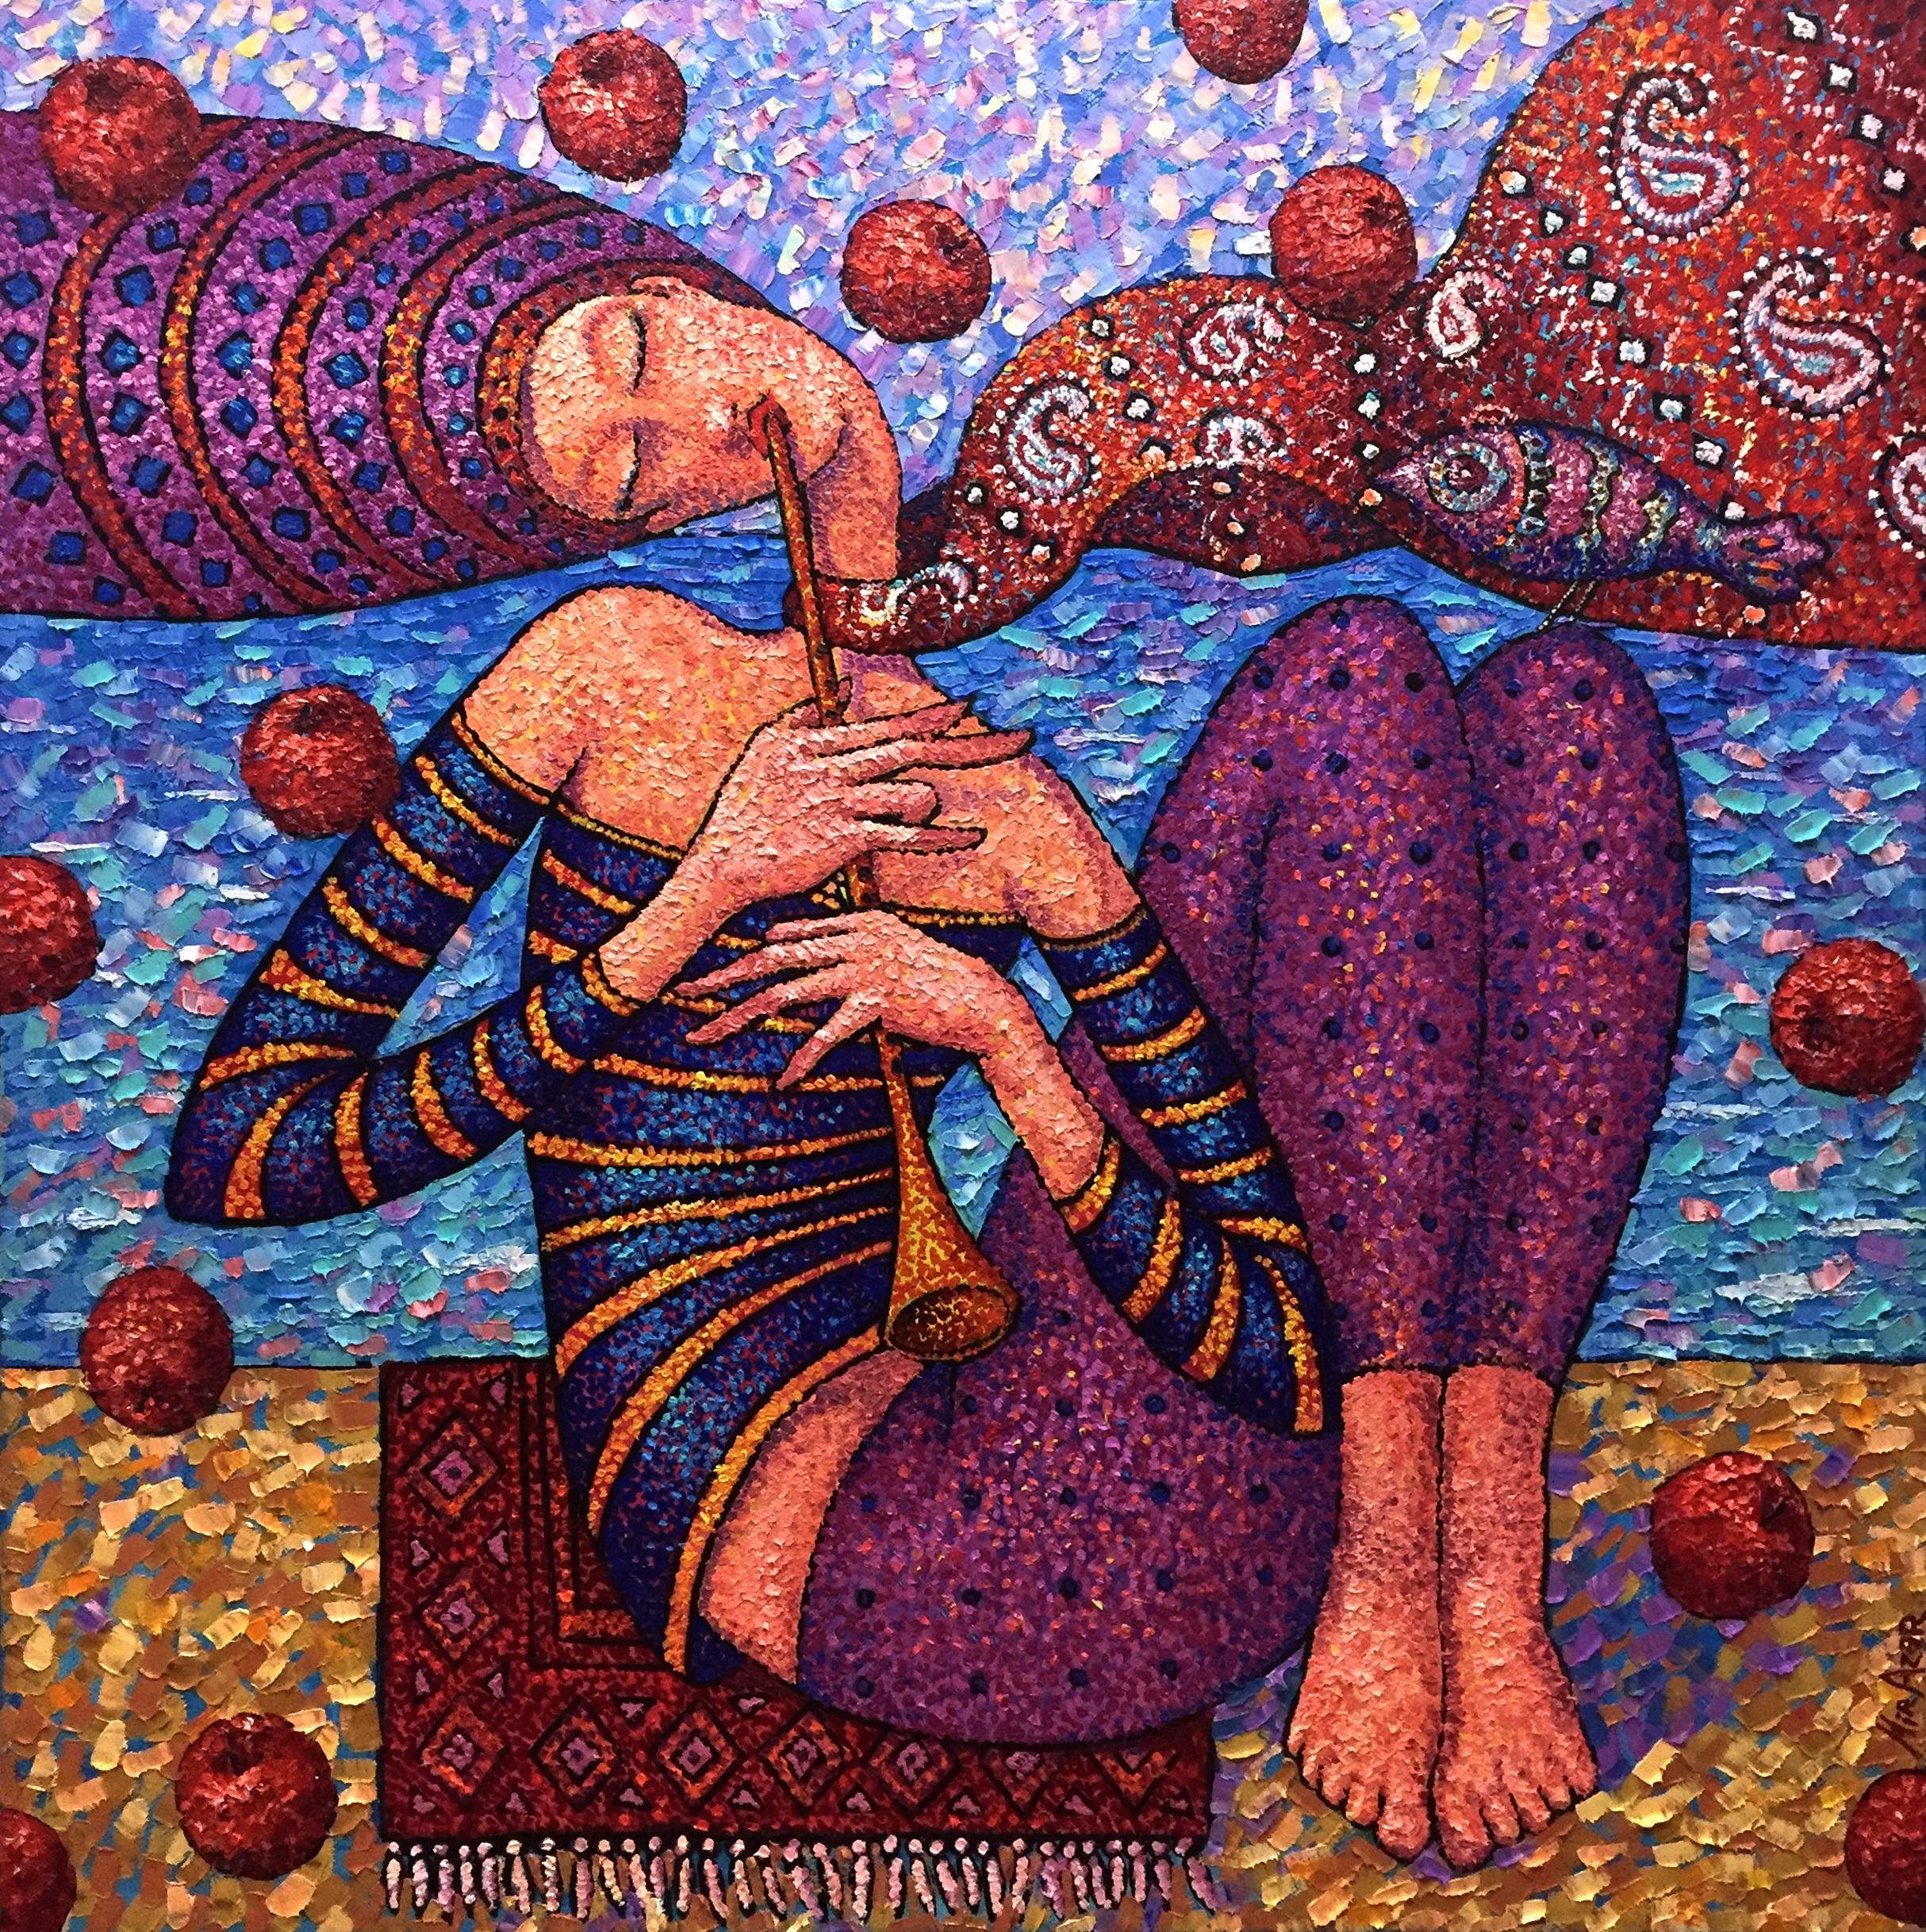 Duet artwork by Mir Azer - art listed for sale on Artplode